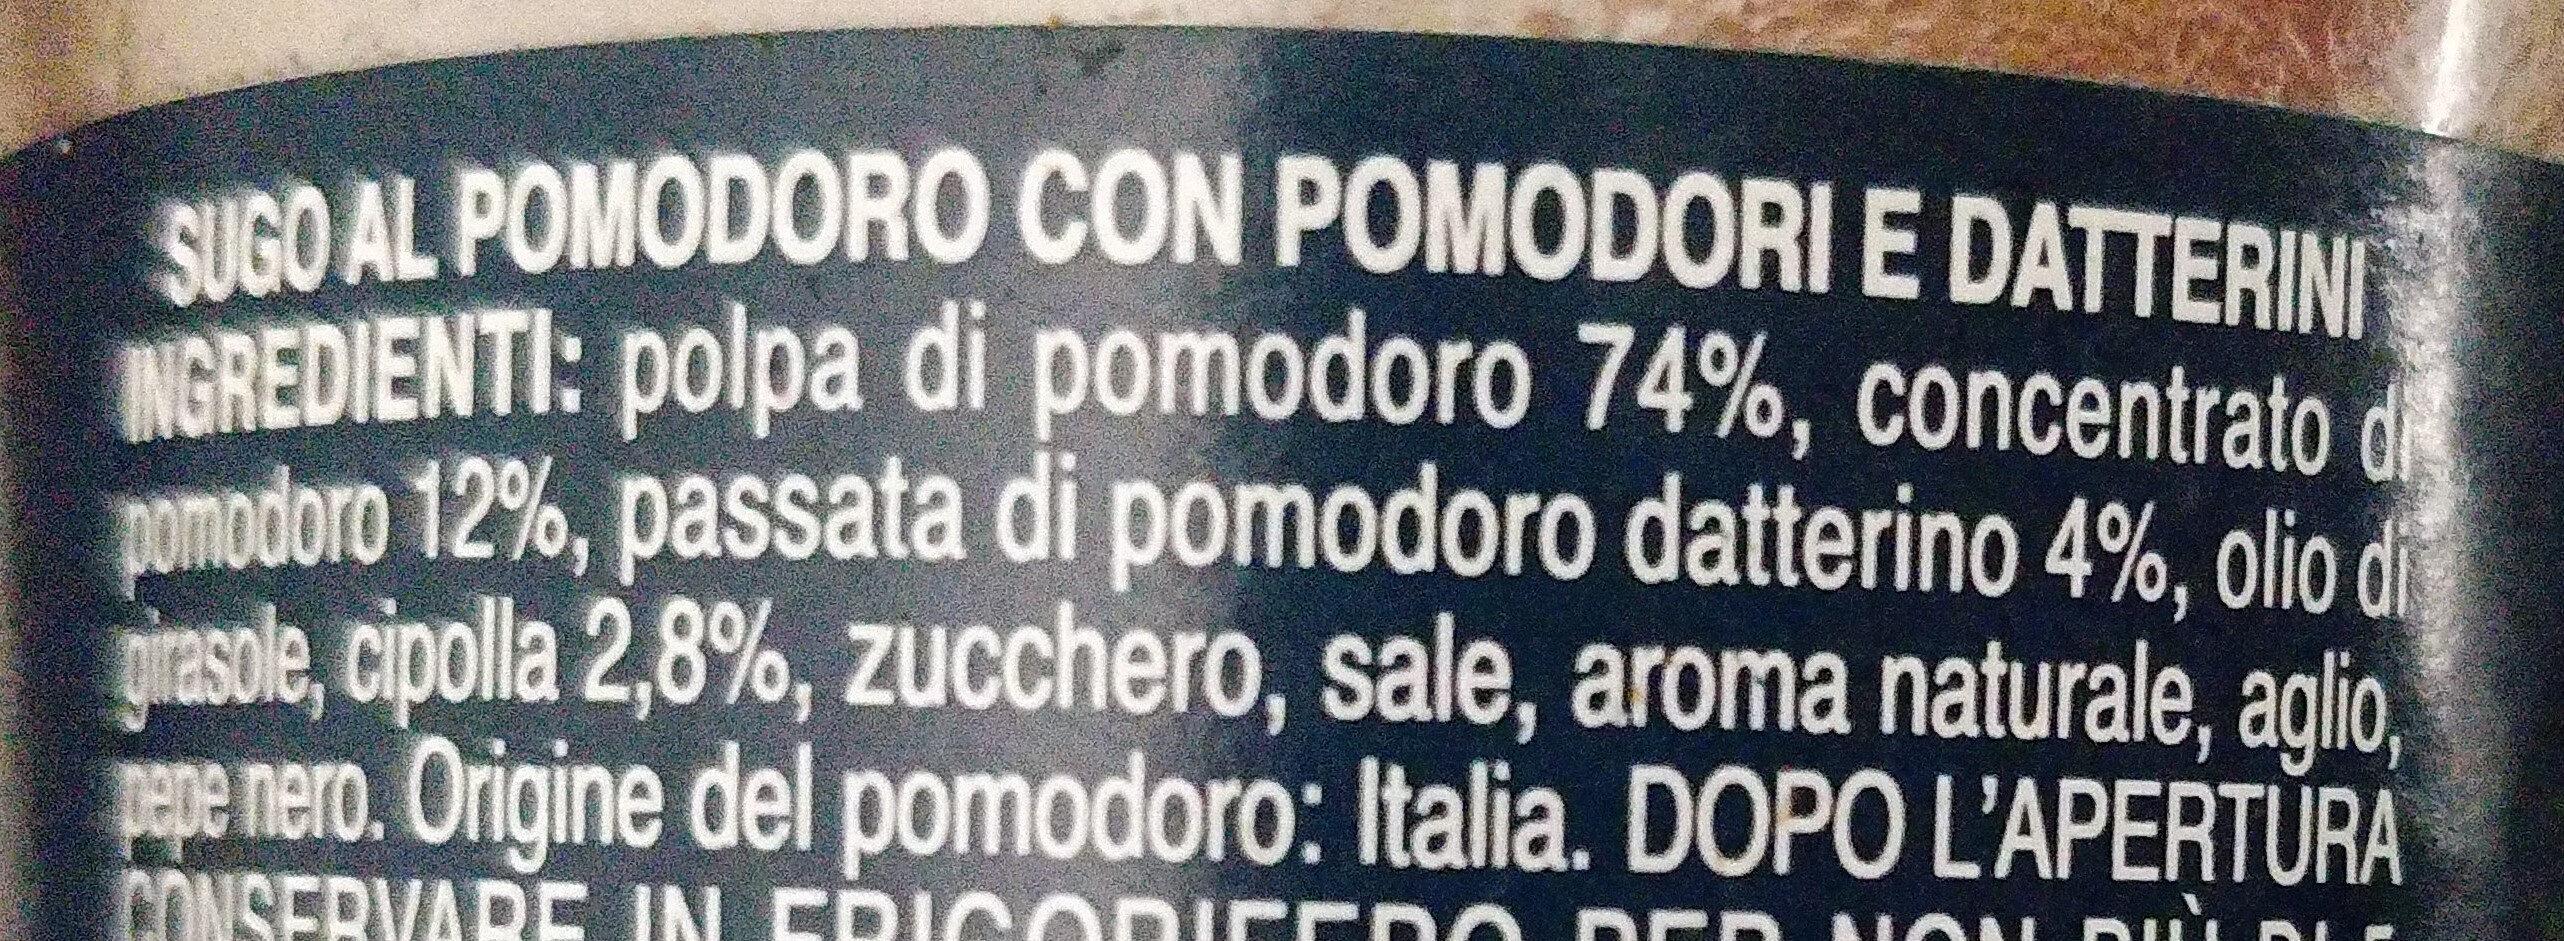 Pomodoro e datterini - Ingredients - it